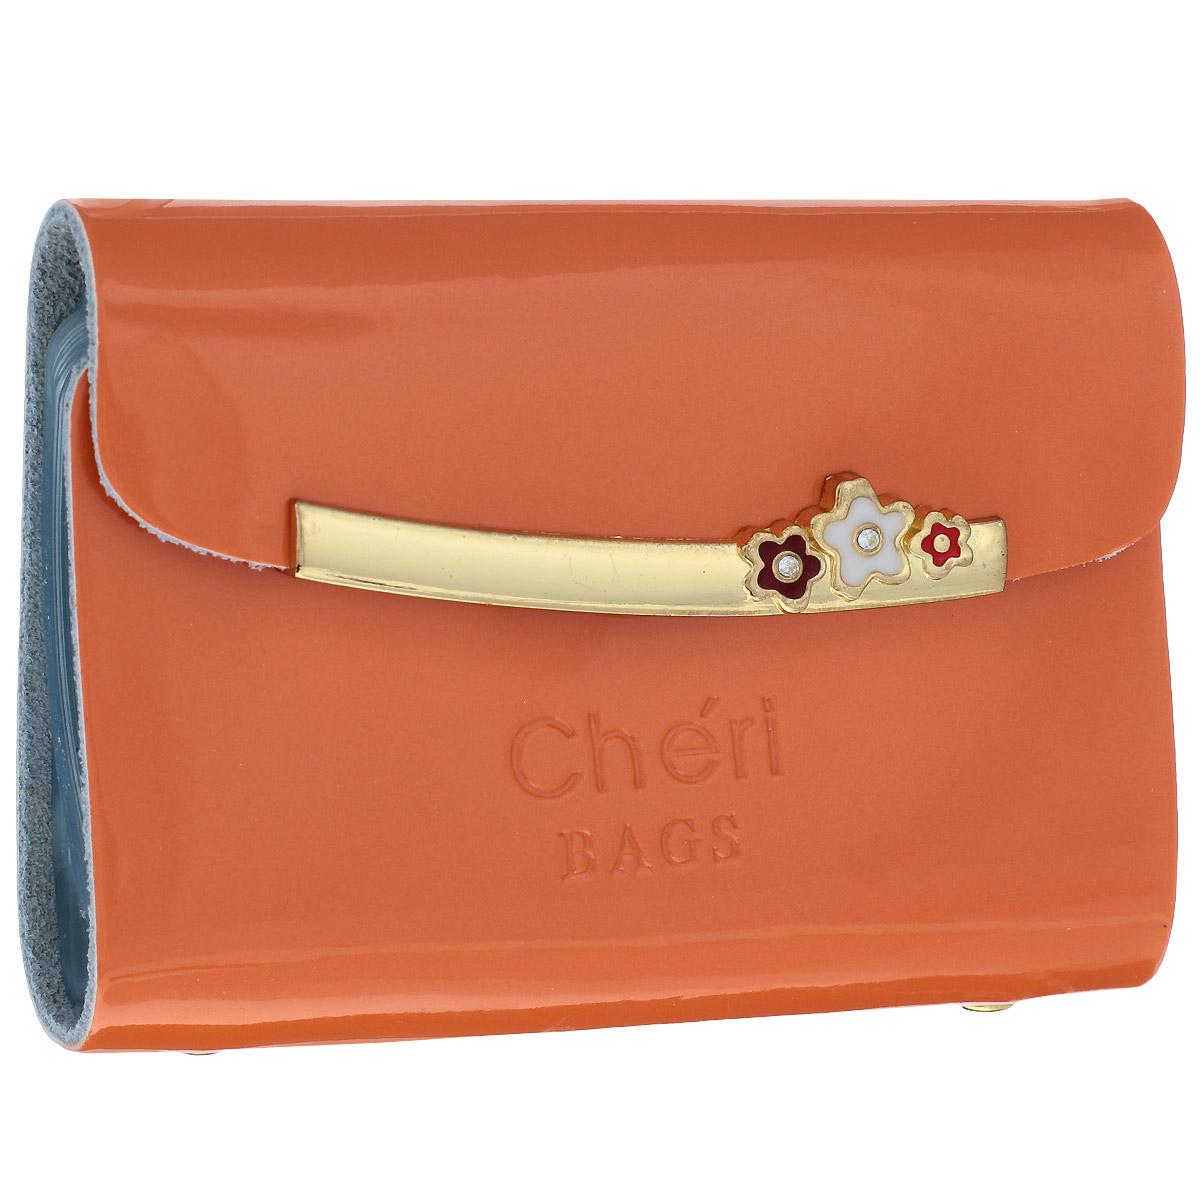 Визитница Cheribags, цвет: оранжевый. V-0494-22V-0494-22